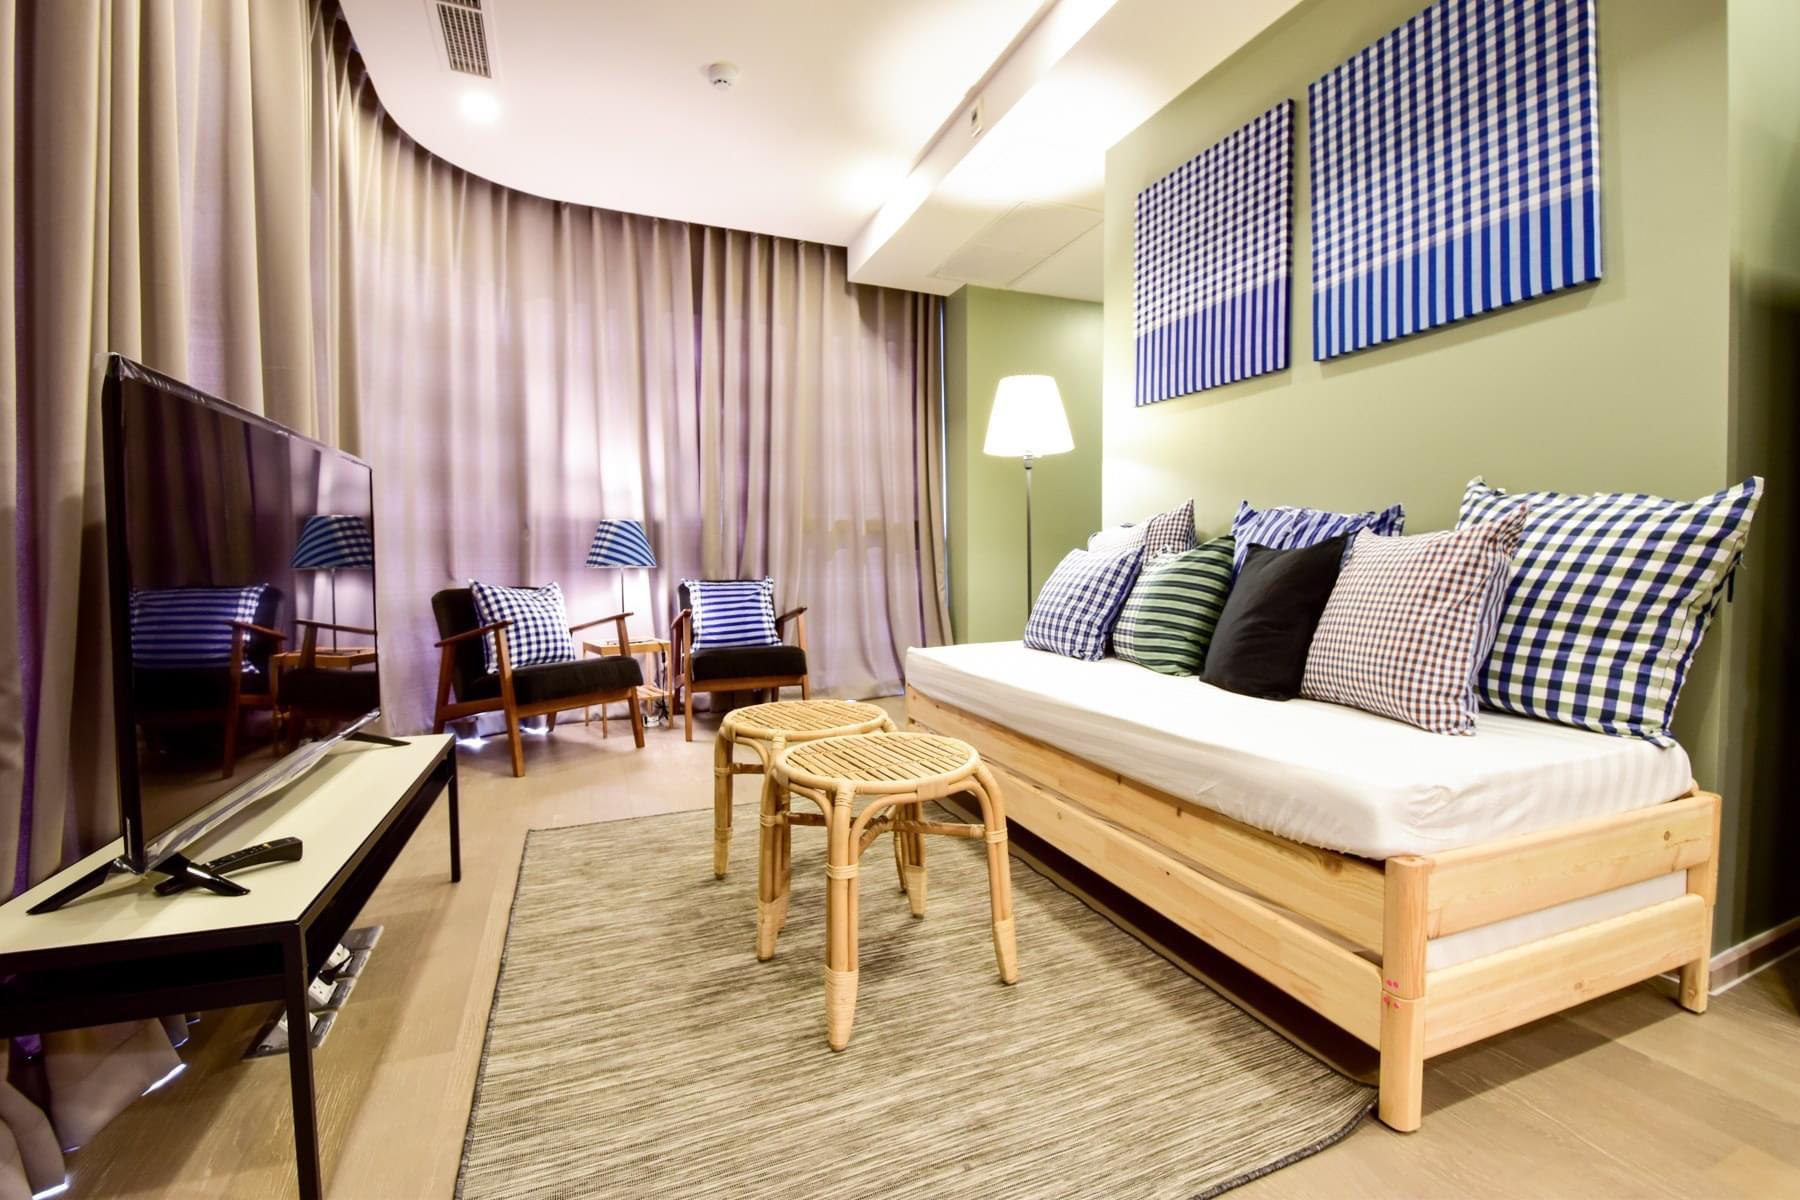 Bangkok Property Condo Apartment Real Estate For Sale in Sukhumvit Rise & Shine in Asok